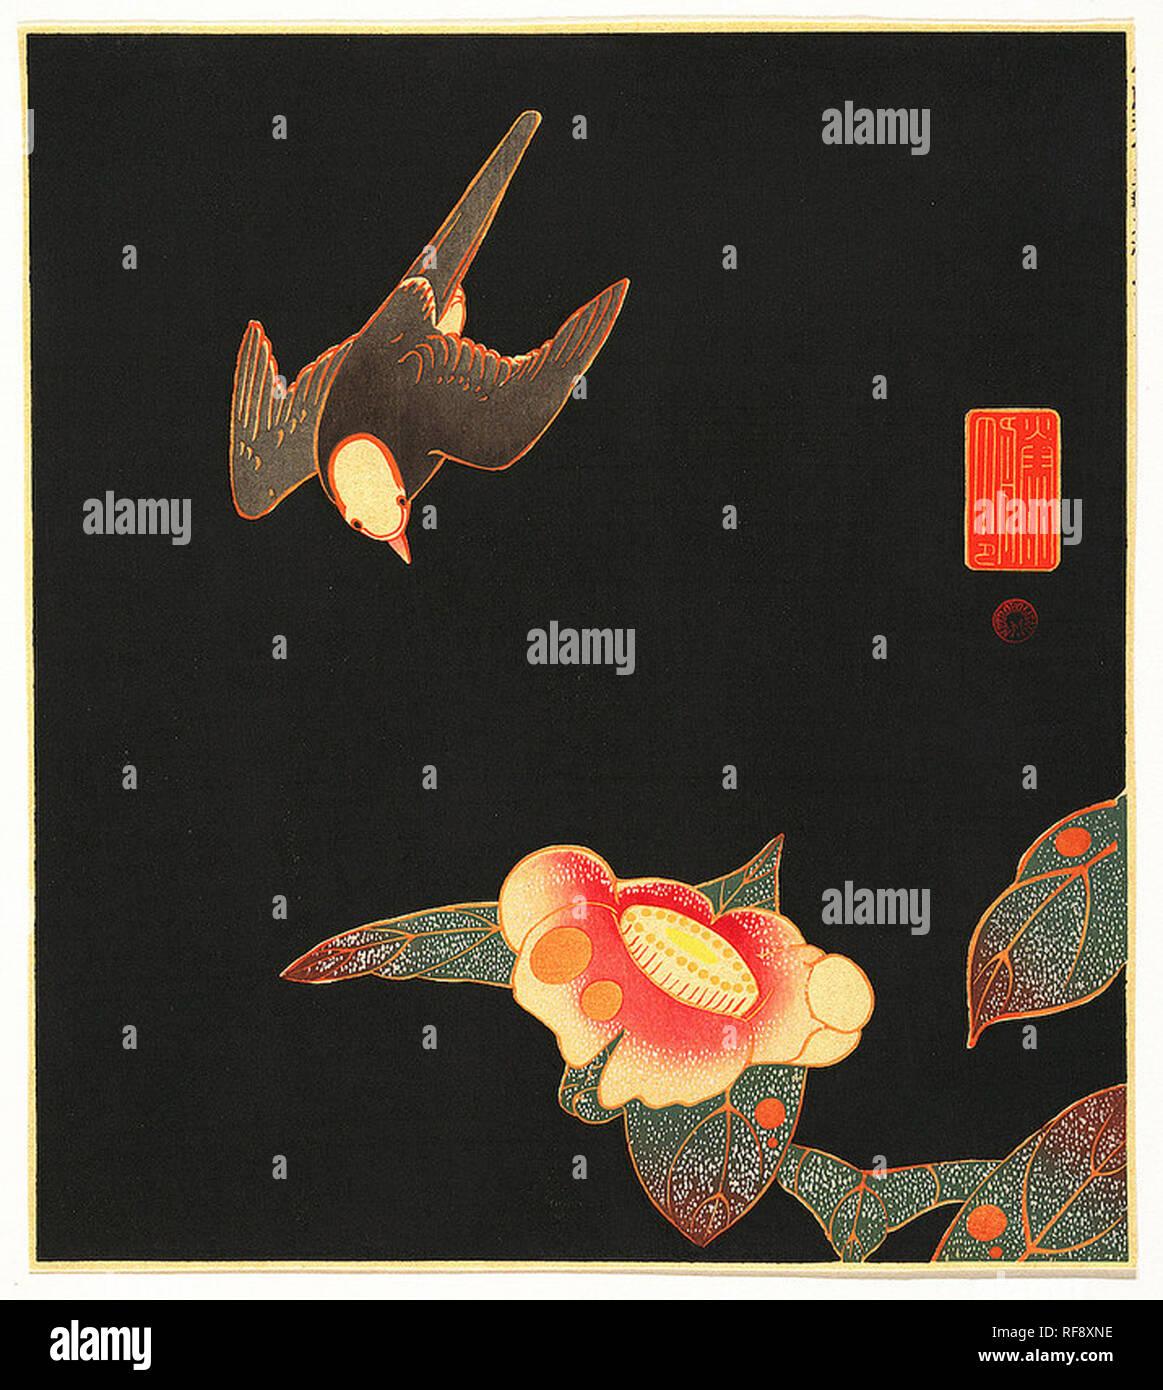 Vintage illustration of a stylised bird - Stock Image